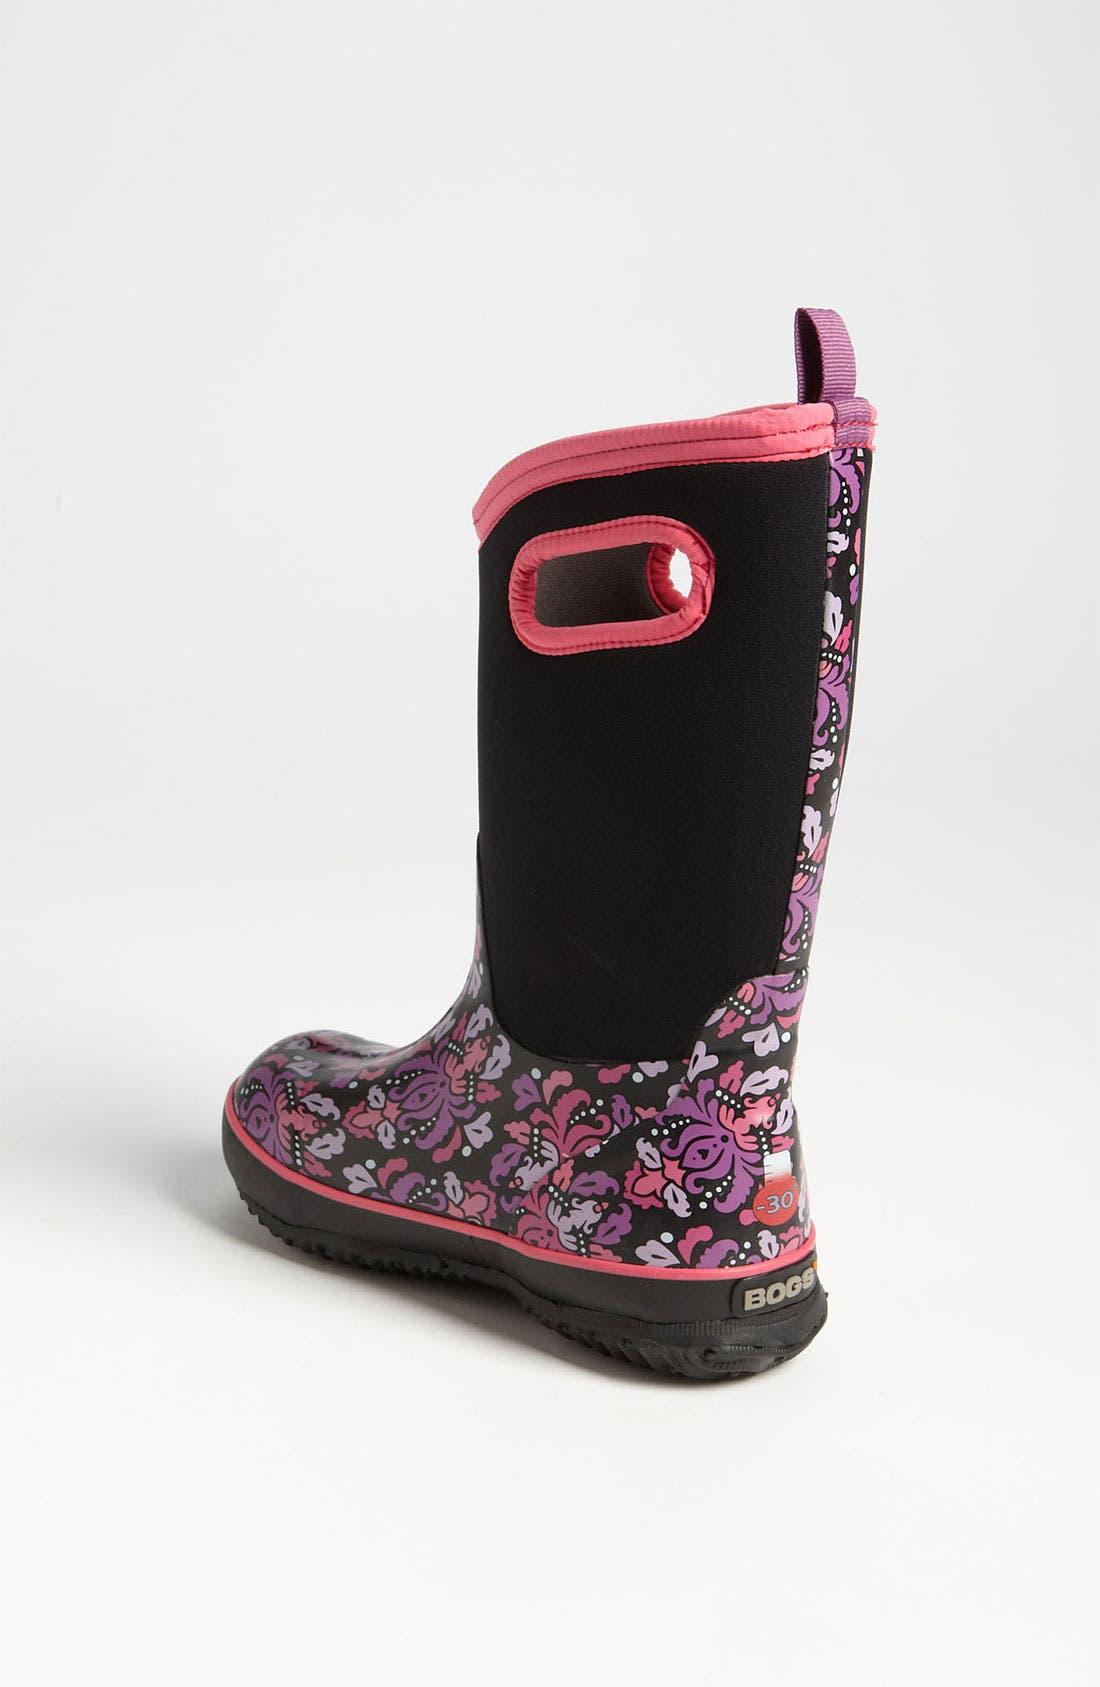 Alternate Image 2  - Bogs 'Classic High - Fleur' Waterproof Boot (Toddler, Little Kid & Big Kid) (Nordstrom Exclusive)